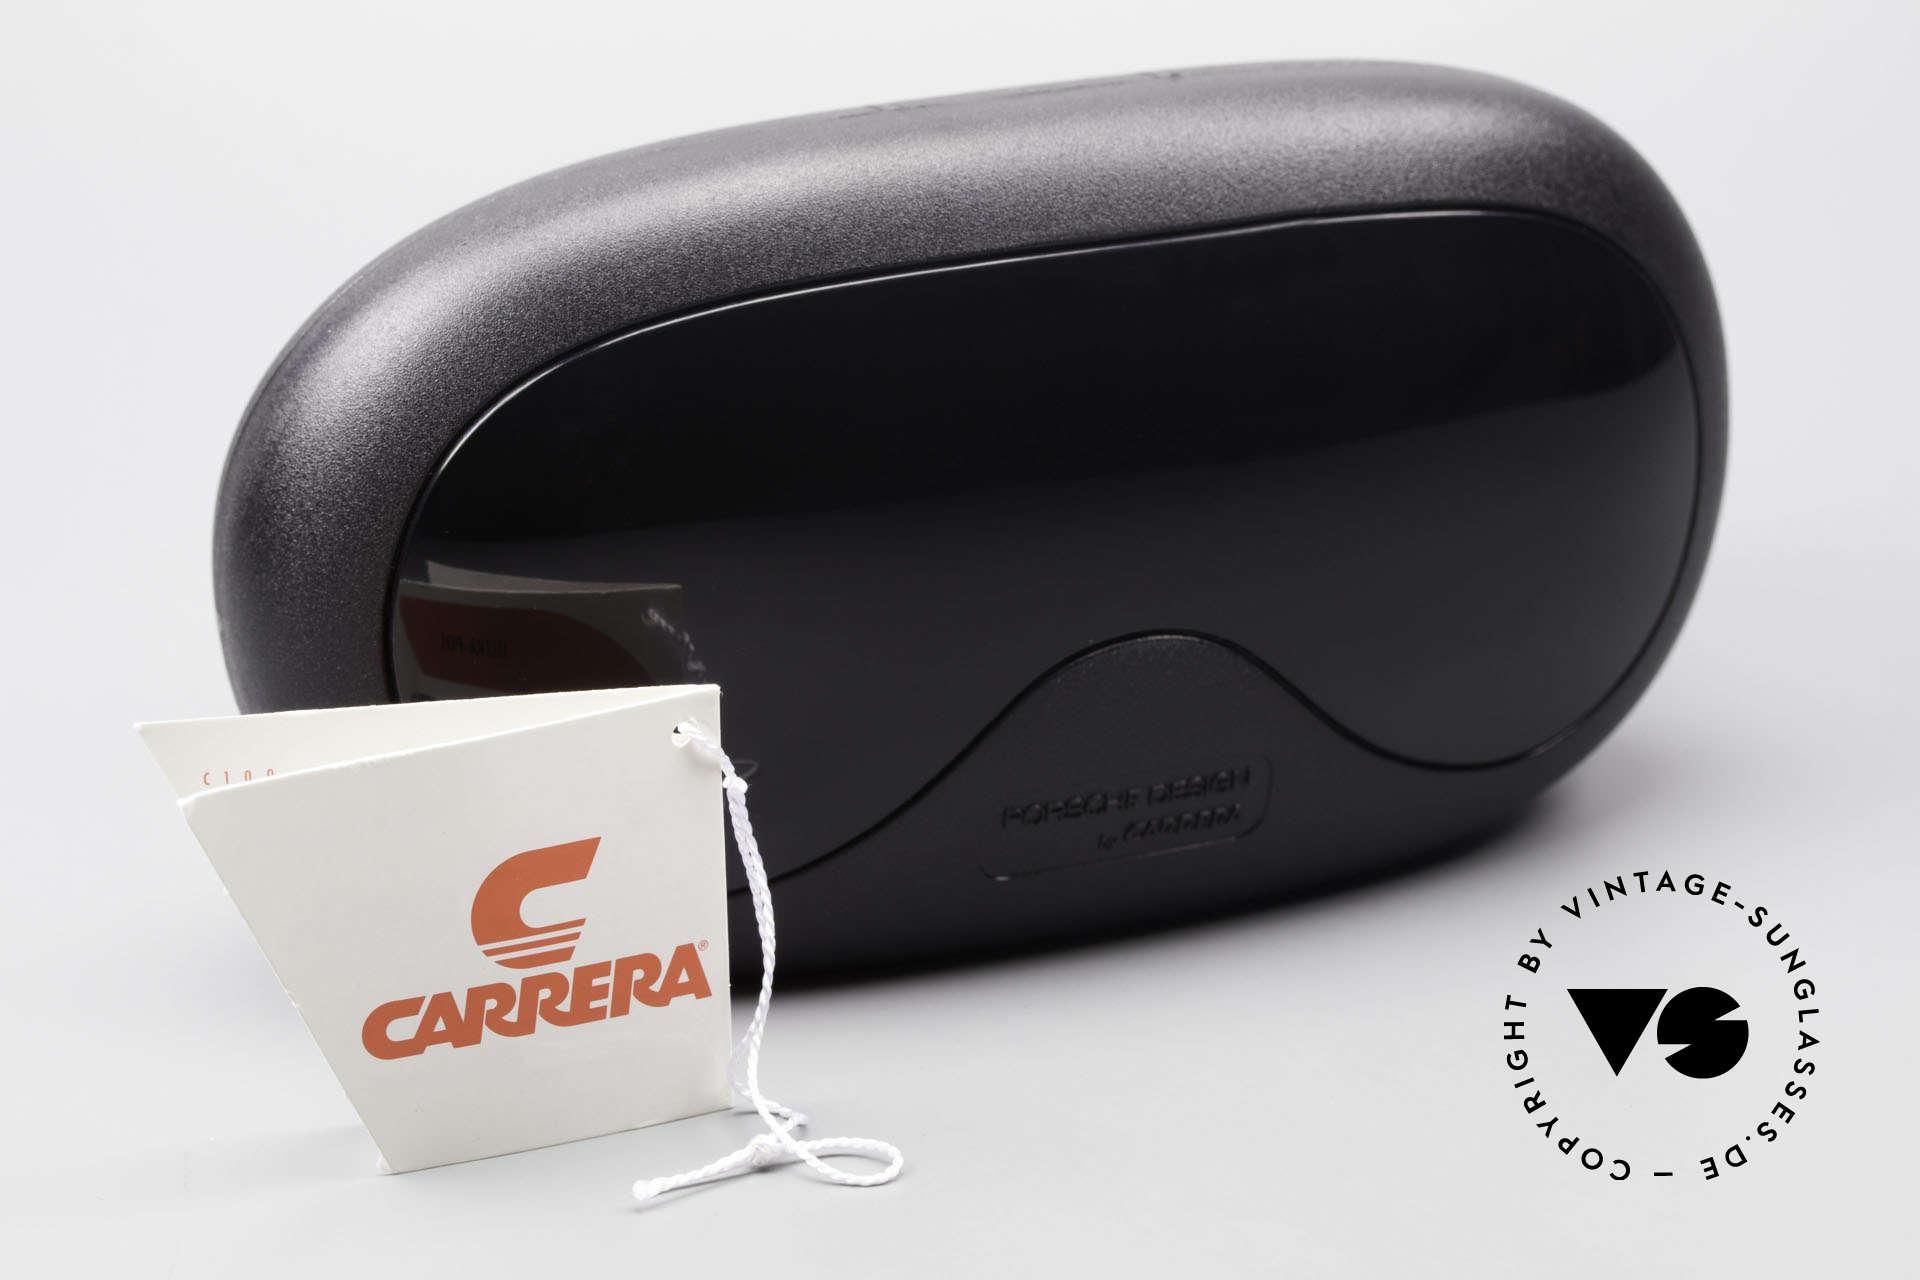 Carrera 5512 Polarized UltraPol Sun Lenses, Size: extra large, Made for Men